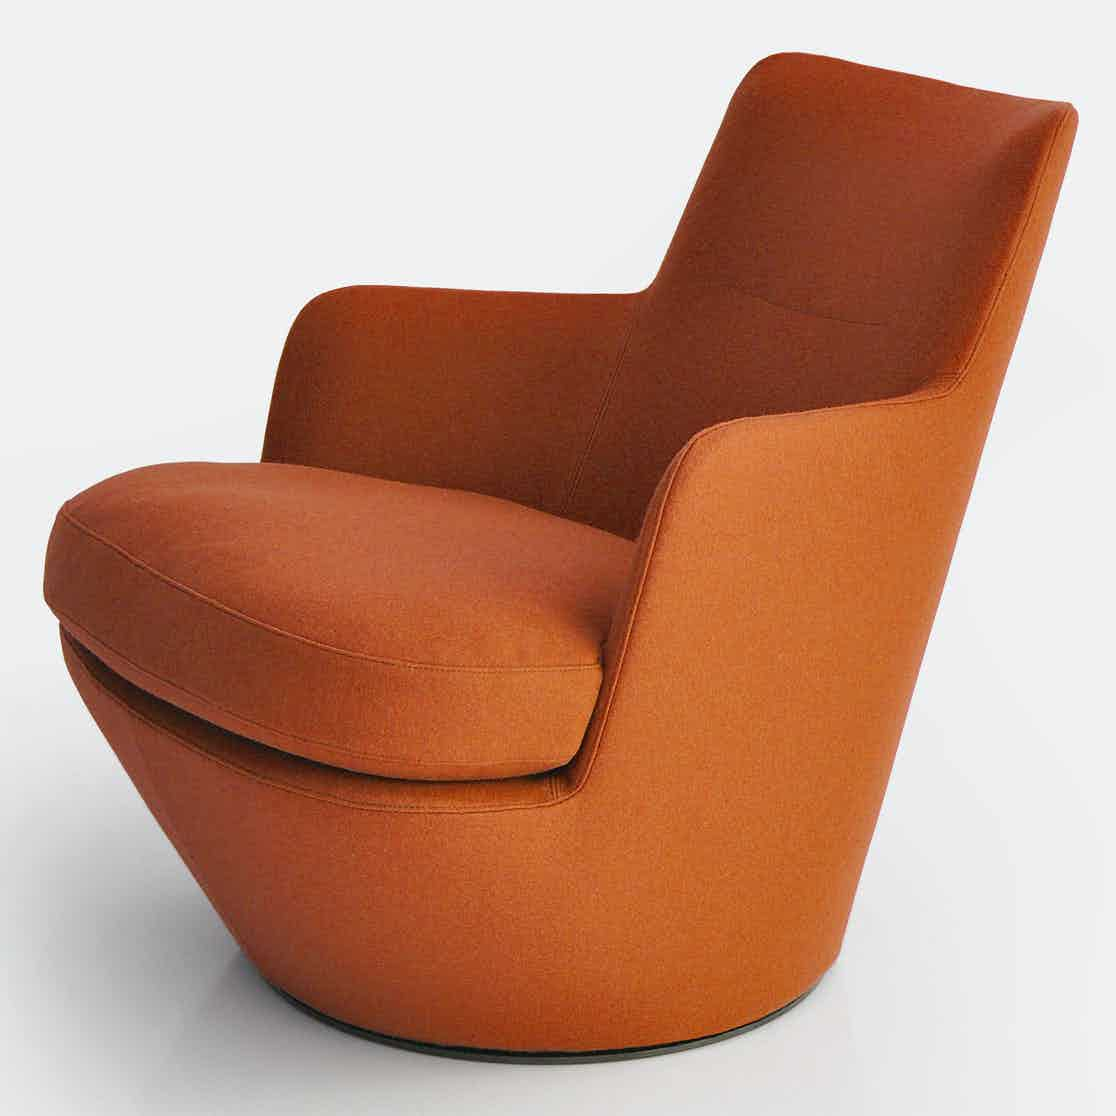 Bensen furniture lo turn chair orange haute living